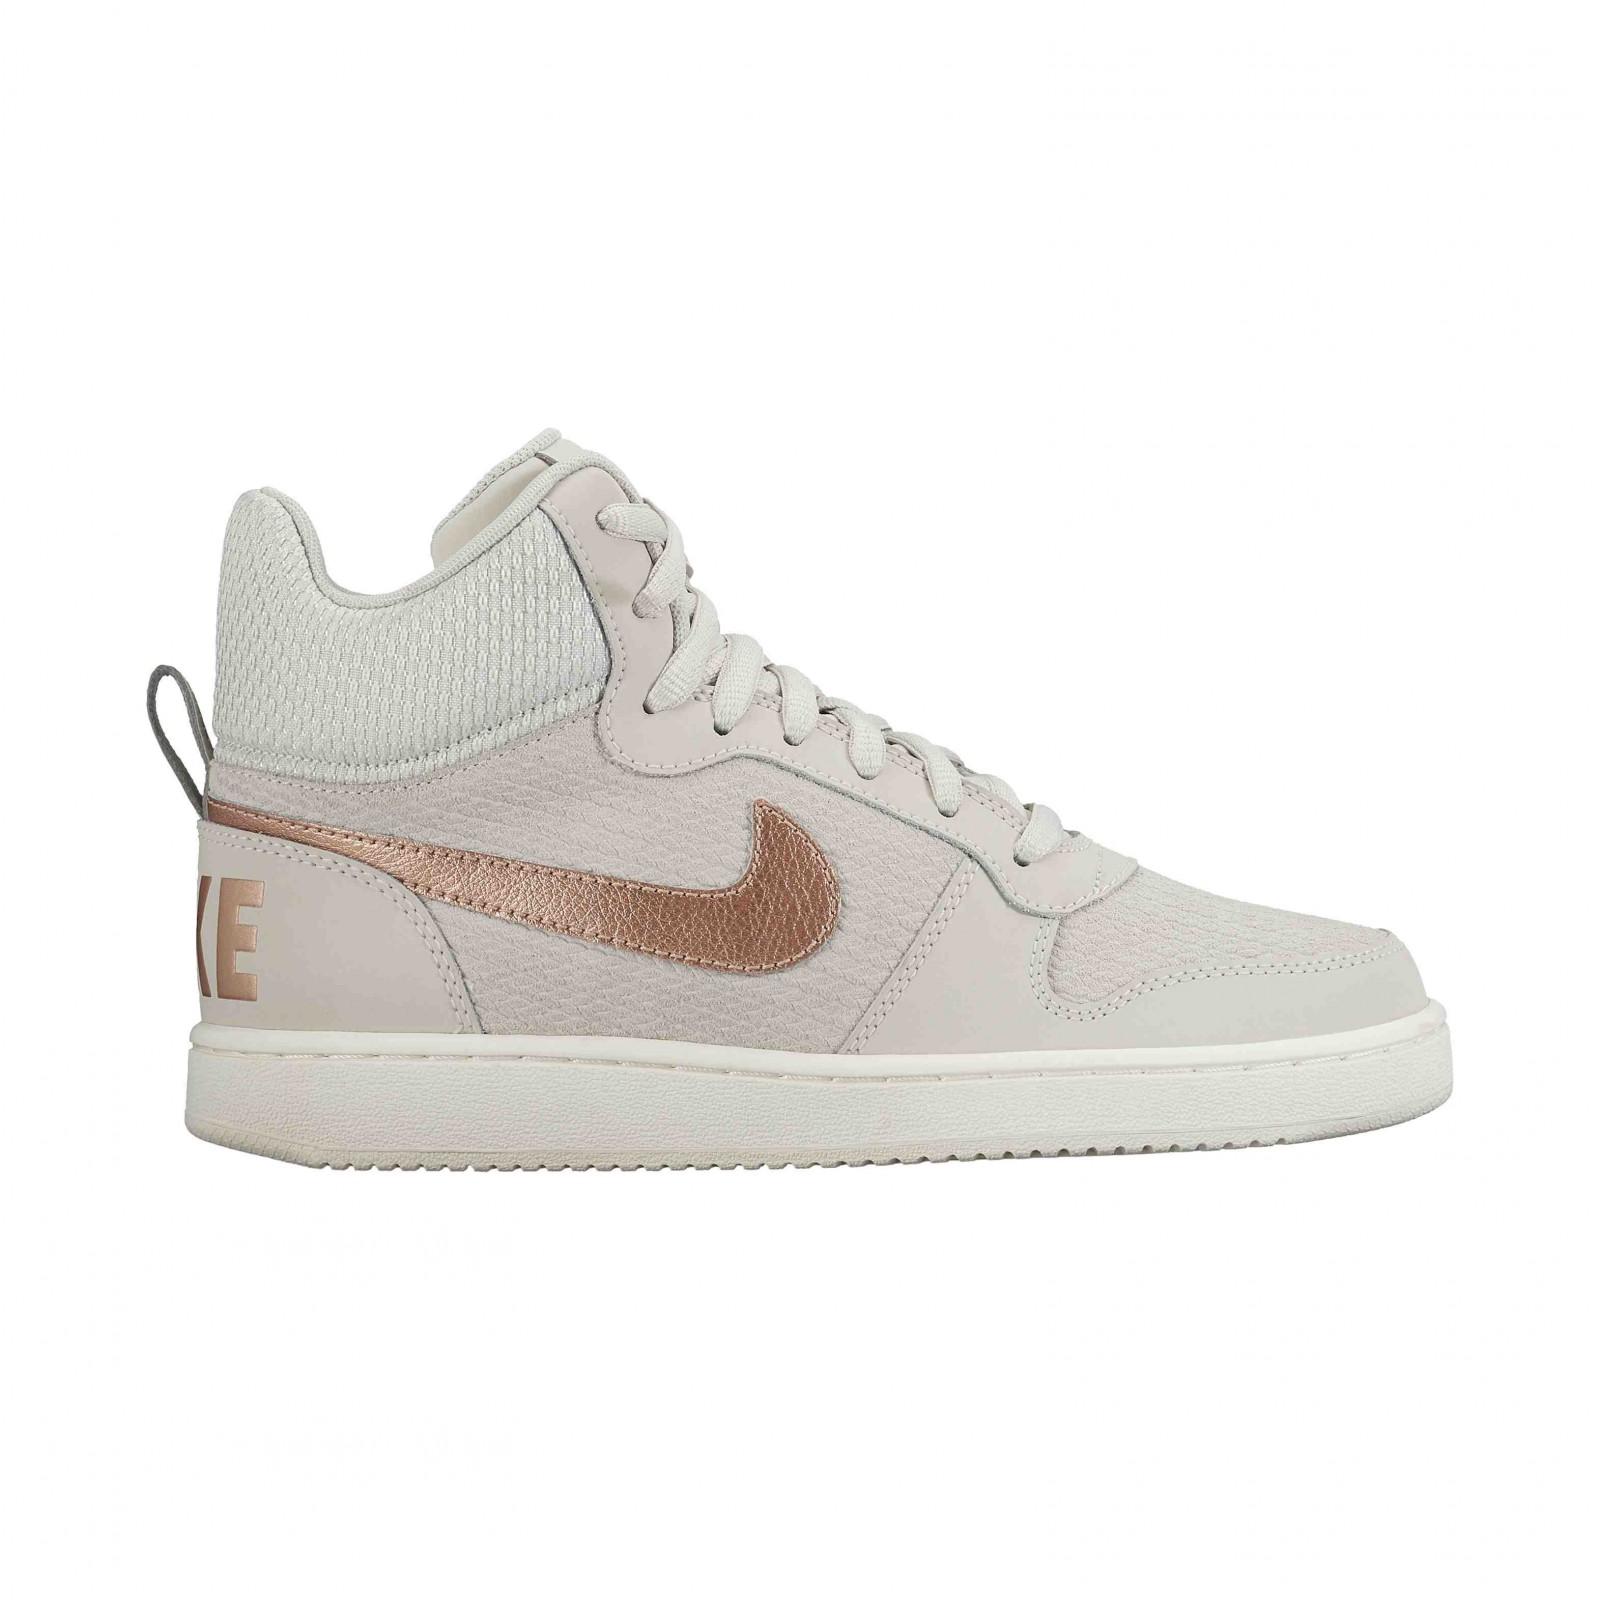 Dámské tenisky Nike W COURT BOROUGH MID PREM  574f0c4a658